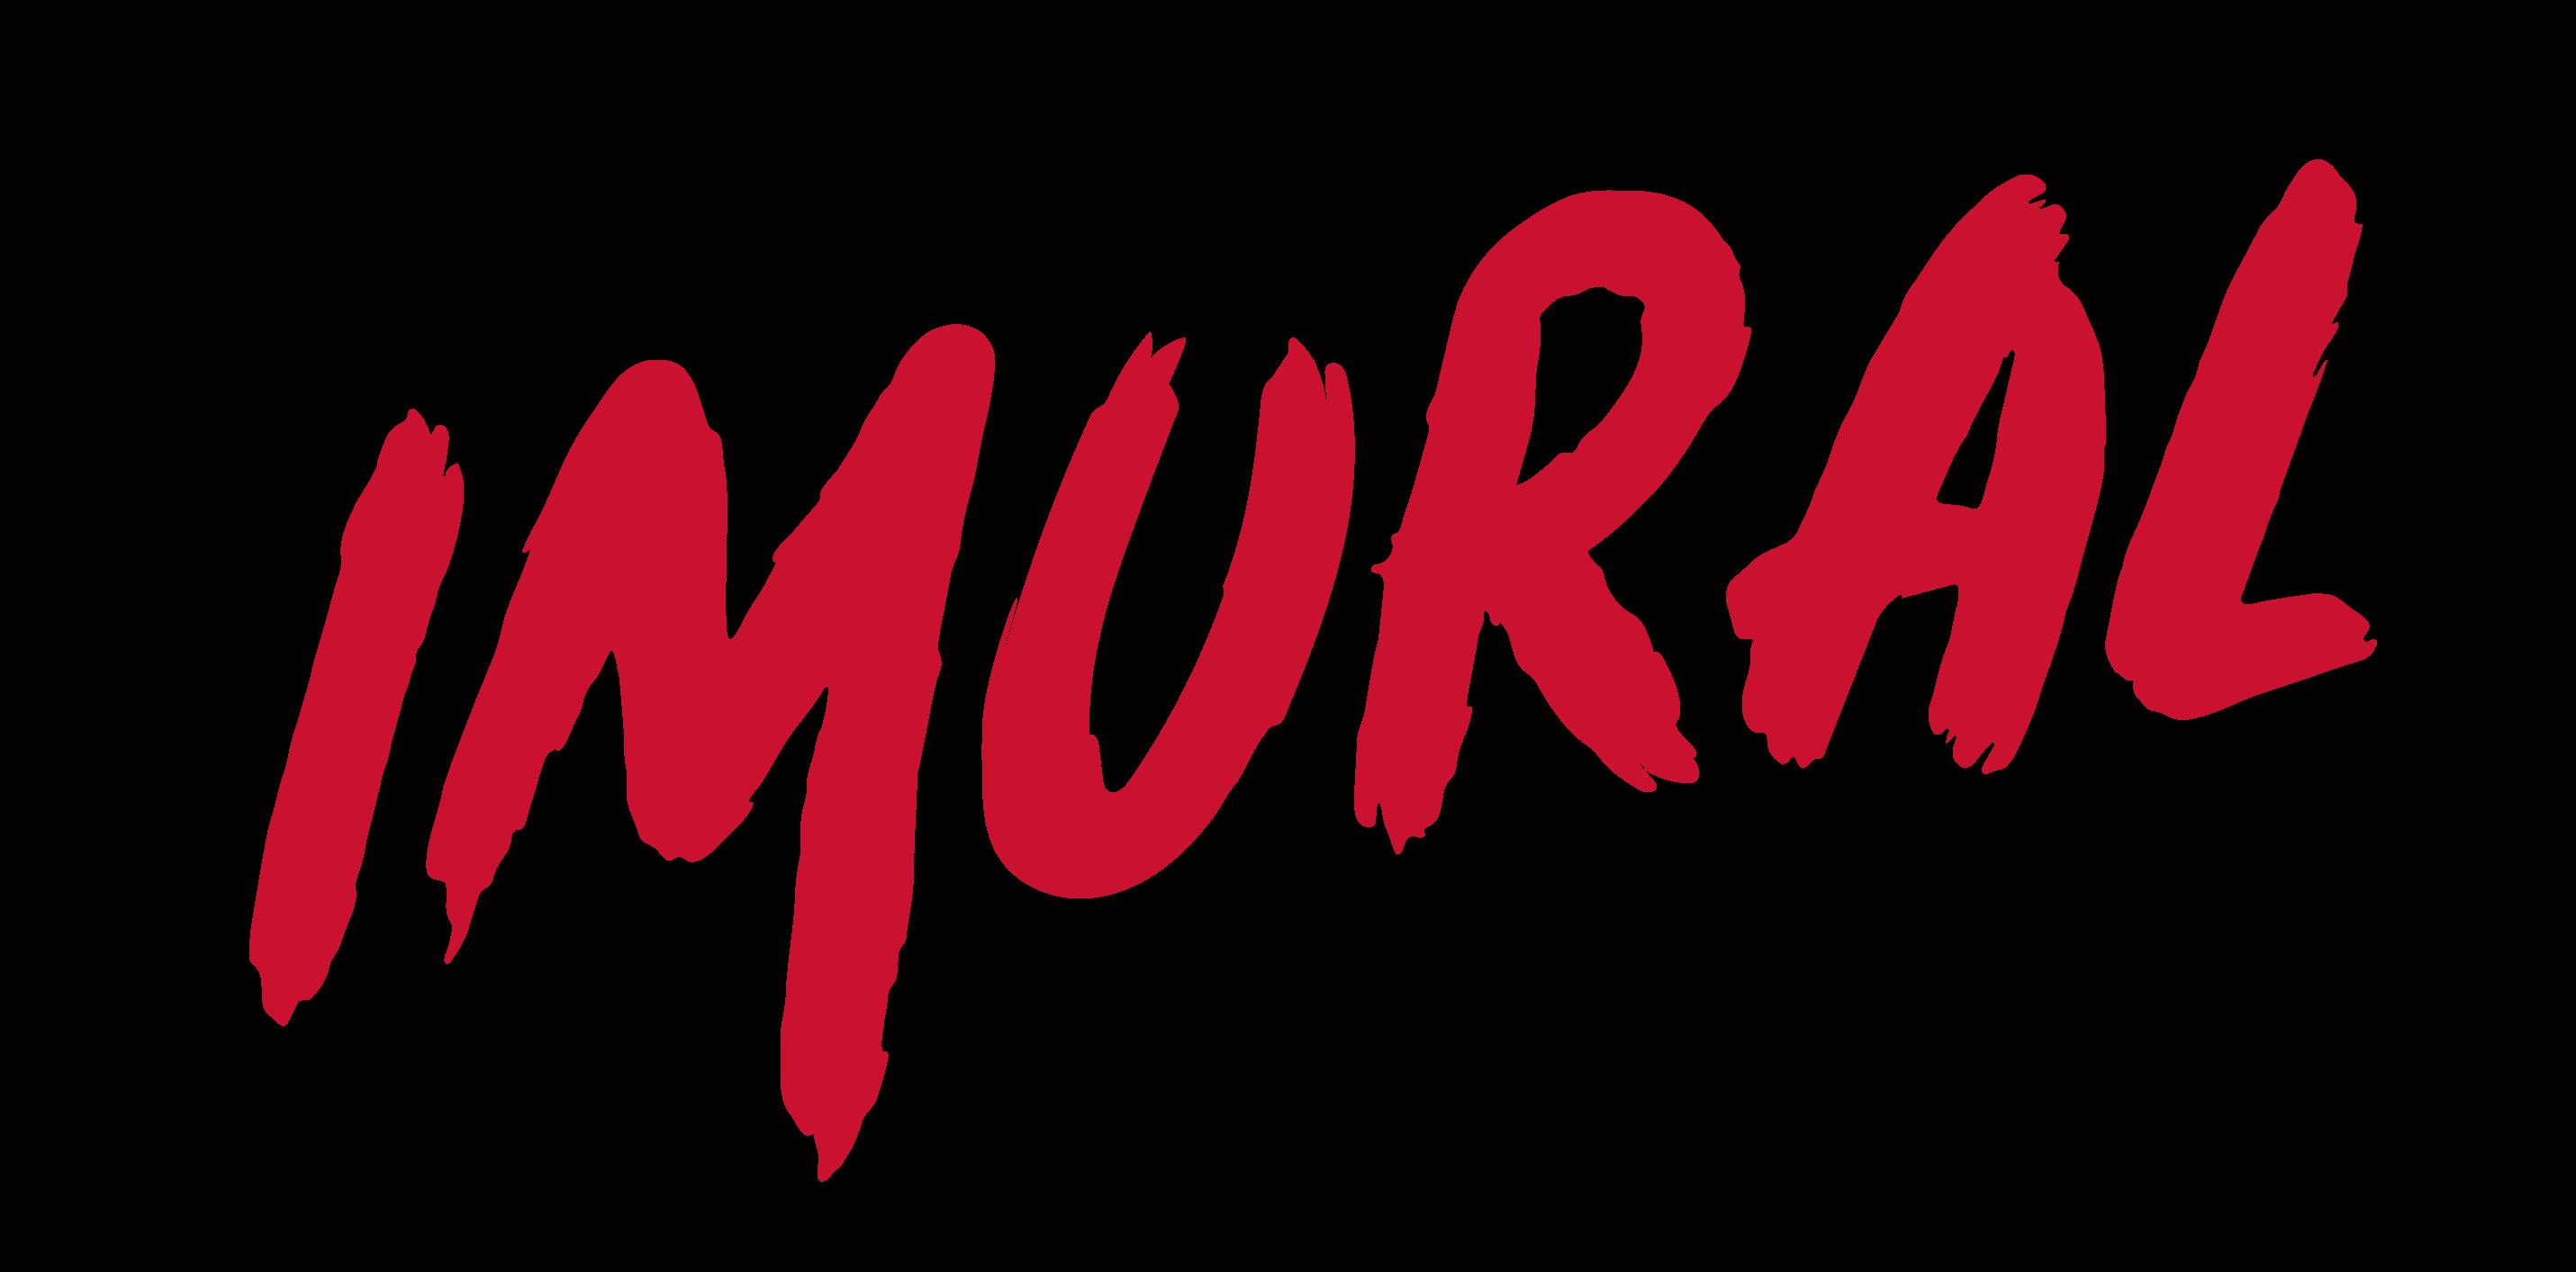 IMURAL